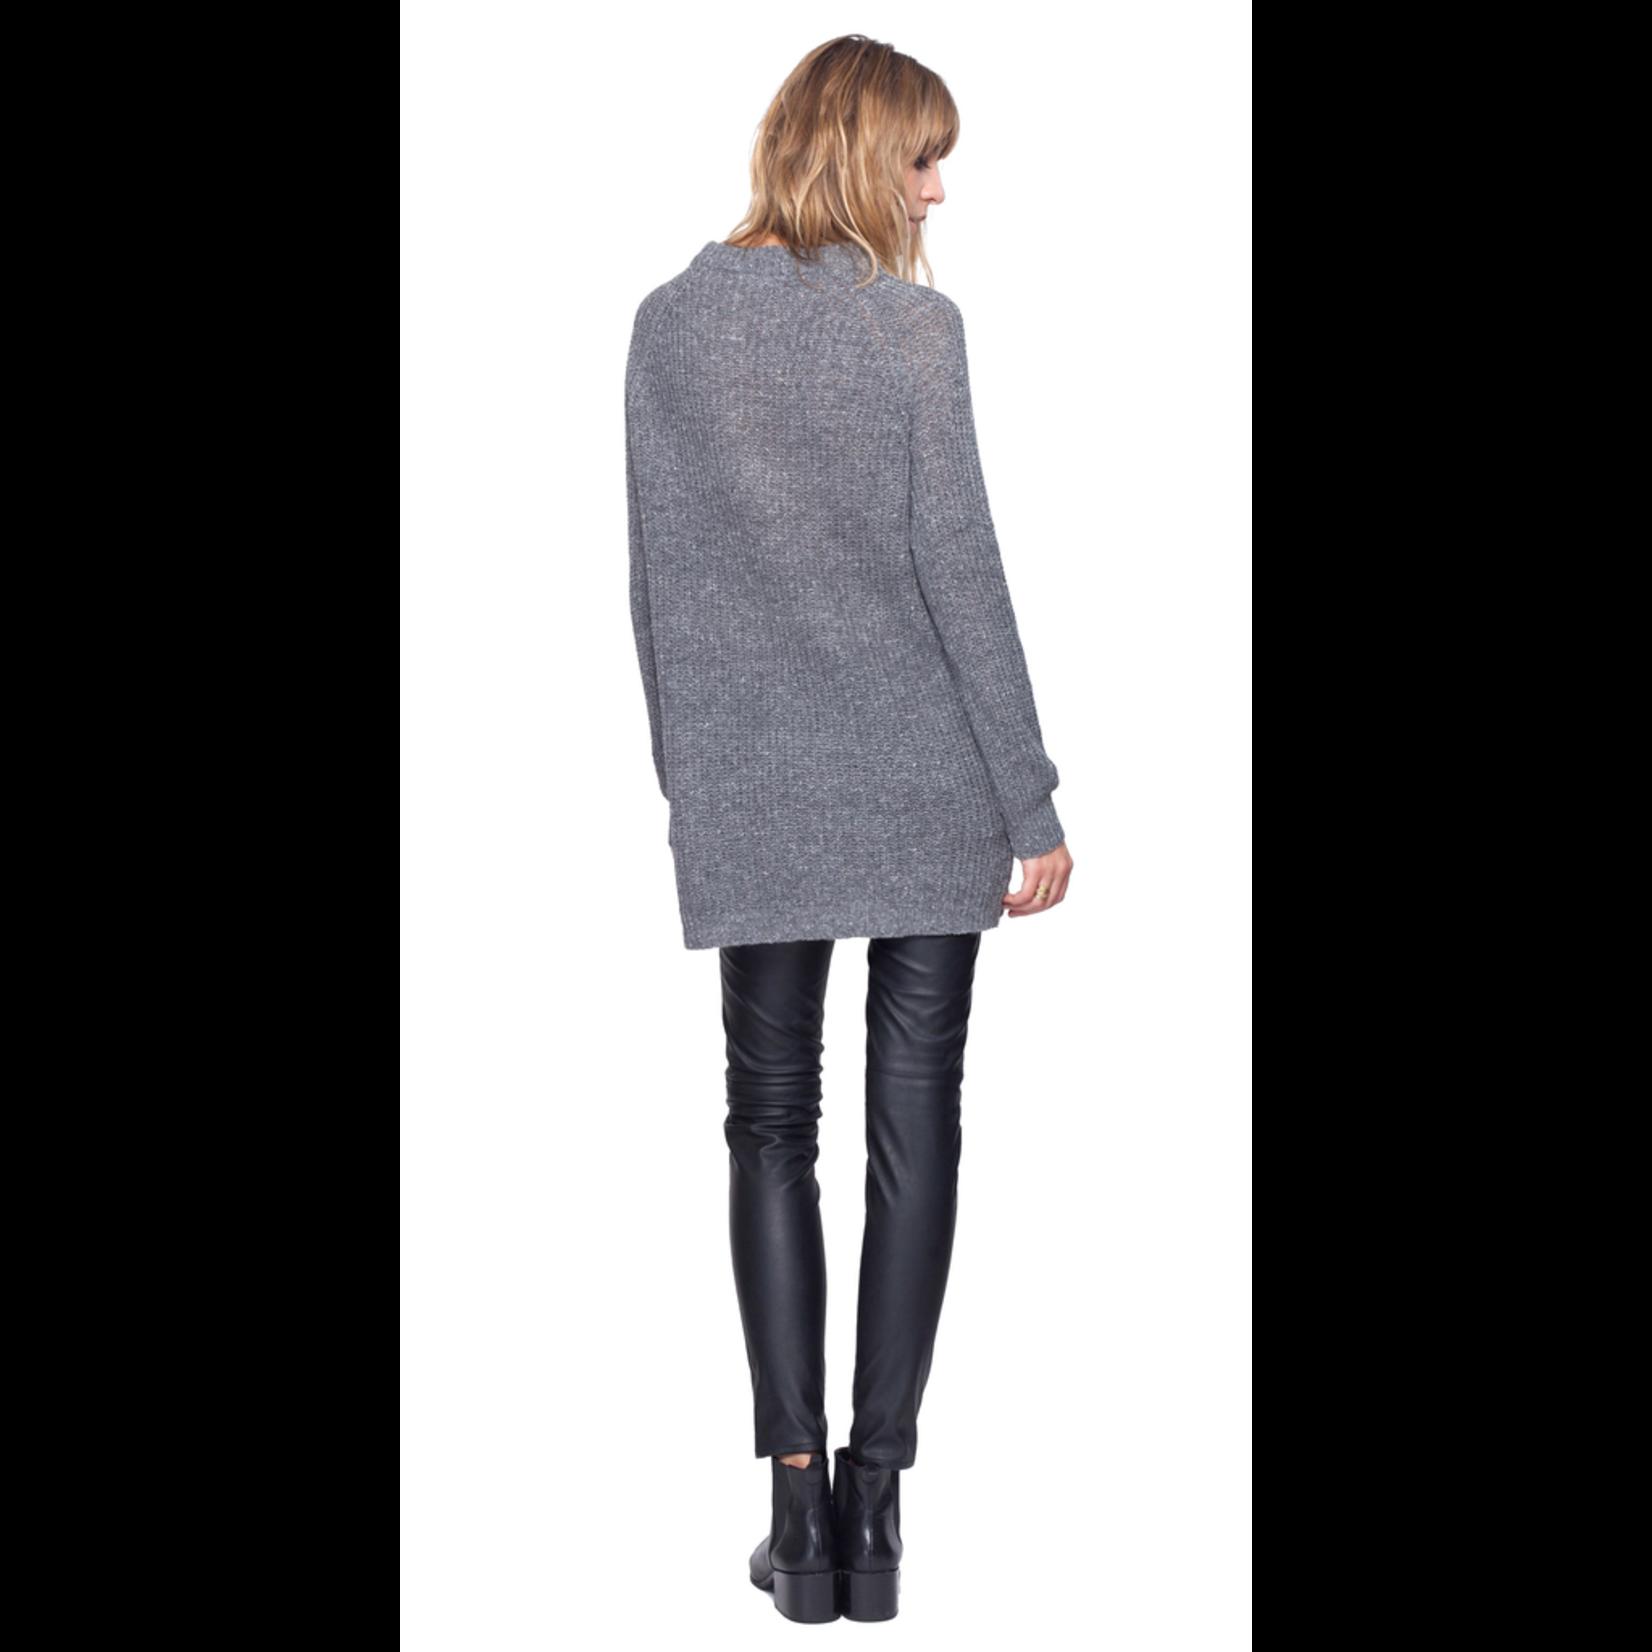 Gentle Fawn Gentle Fawn East Sweater, sale item, Was $125